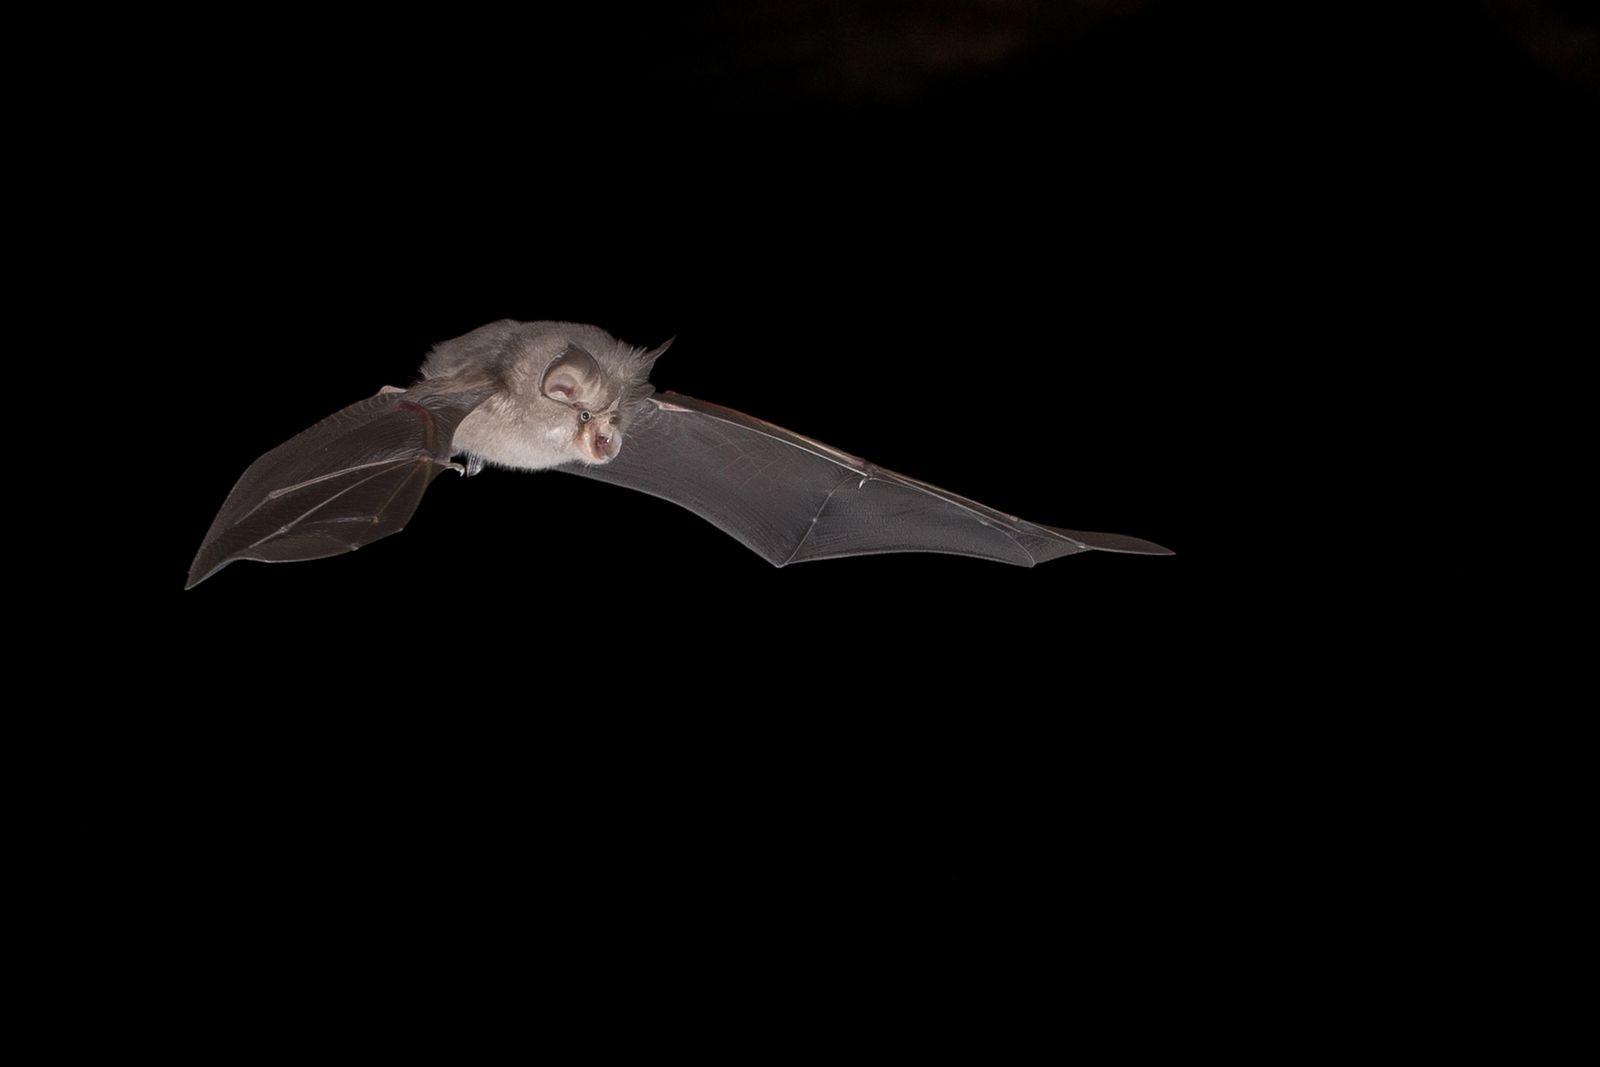 Kleine Hufeisennase, Rhinolophus hipposideros, Lesser horseshoe bat